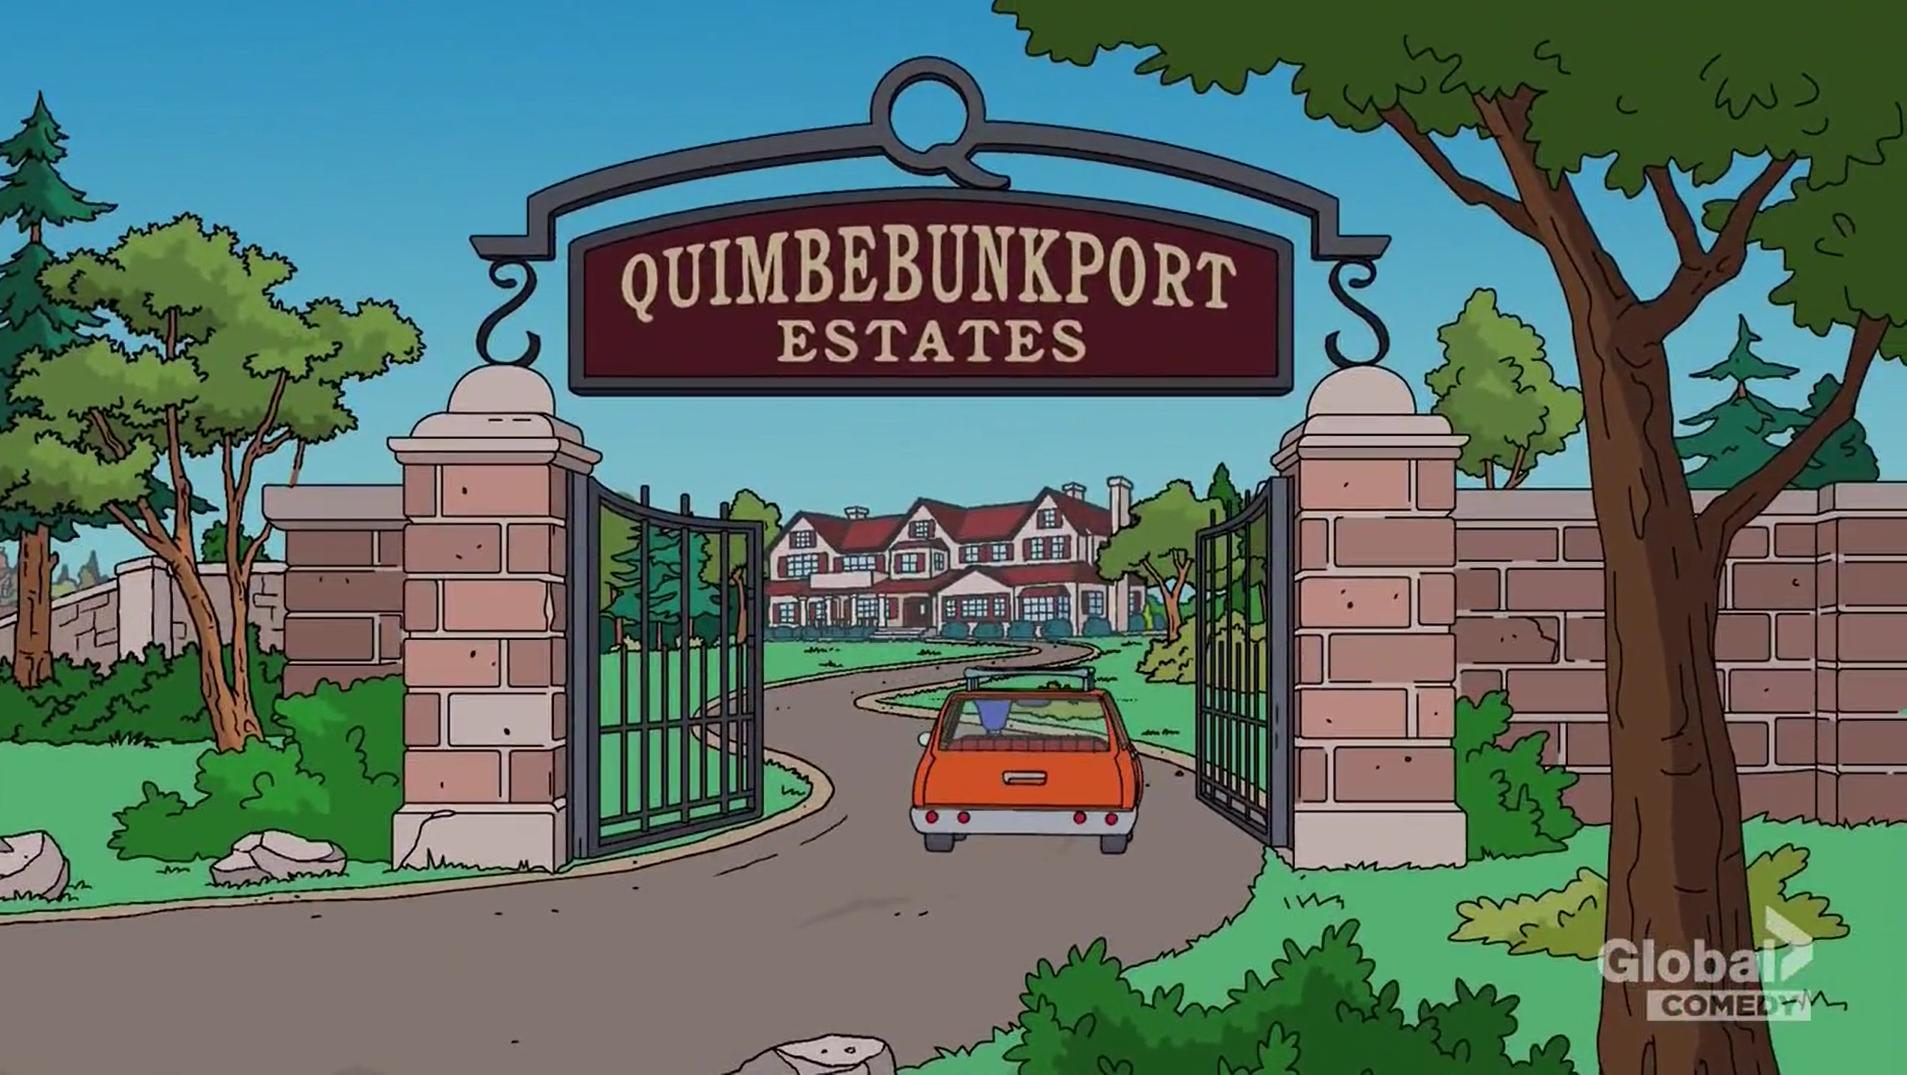 Quimbebunkport Estates.png